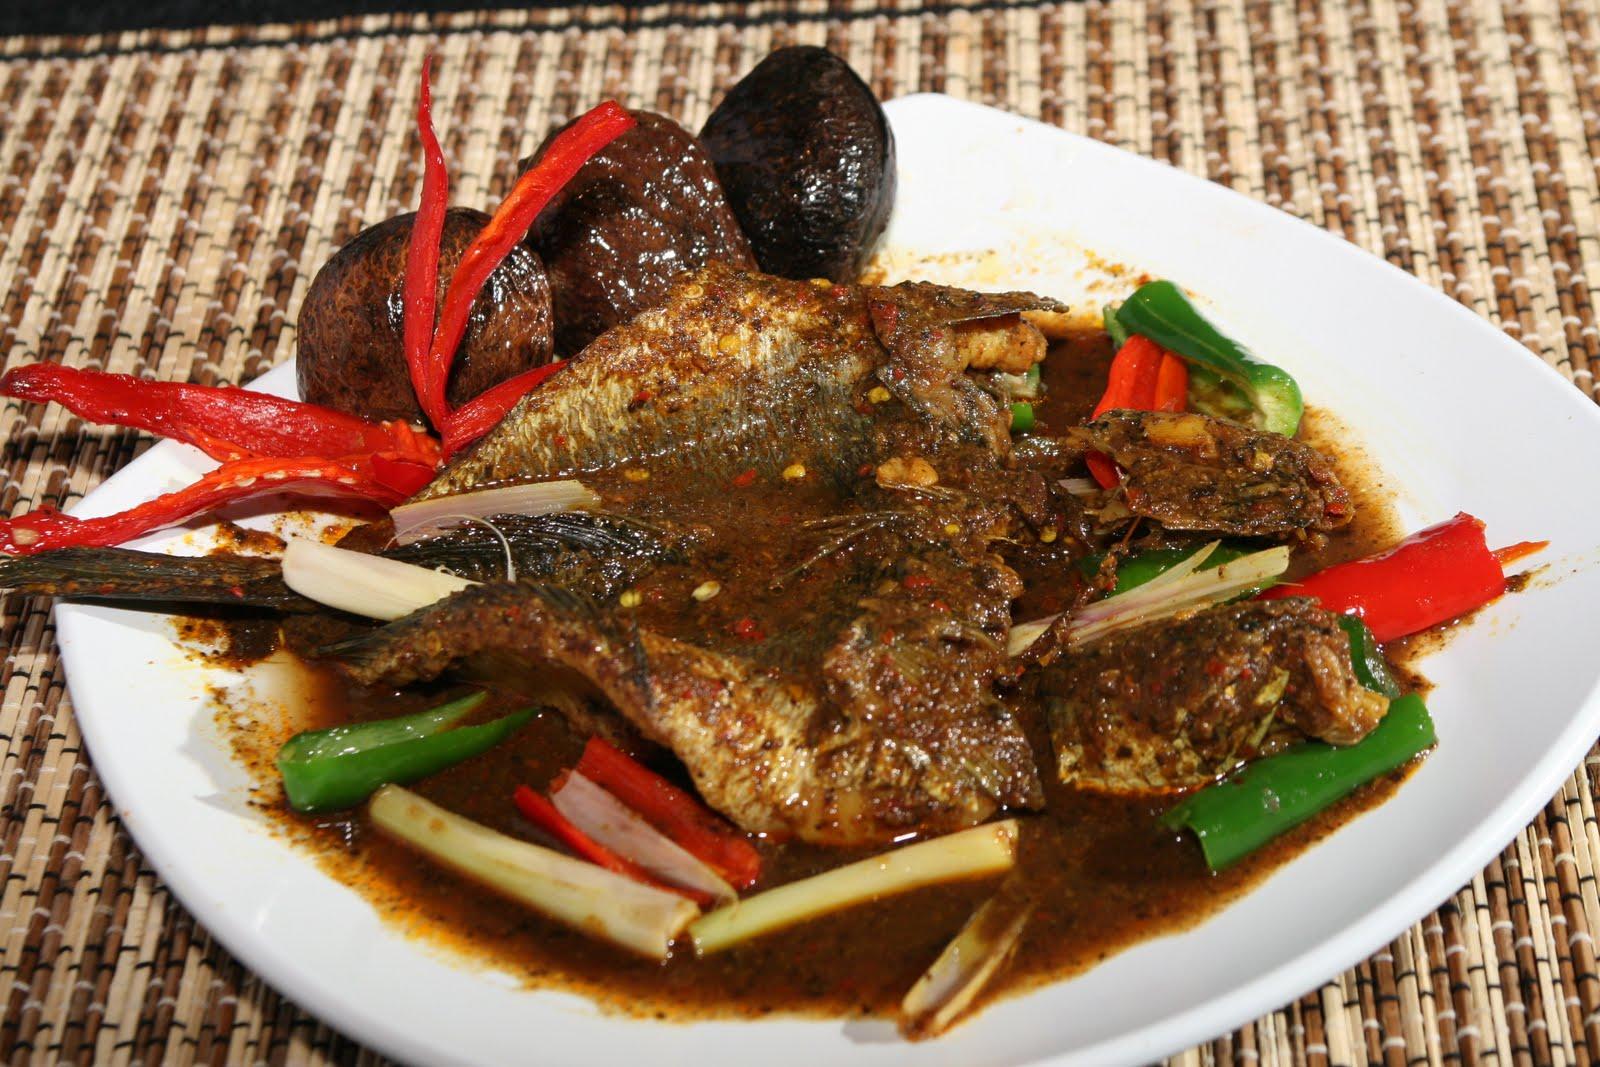 Ikan gabus pucung dimana cara pemasakannya memakai bumbu dasar kluwek